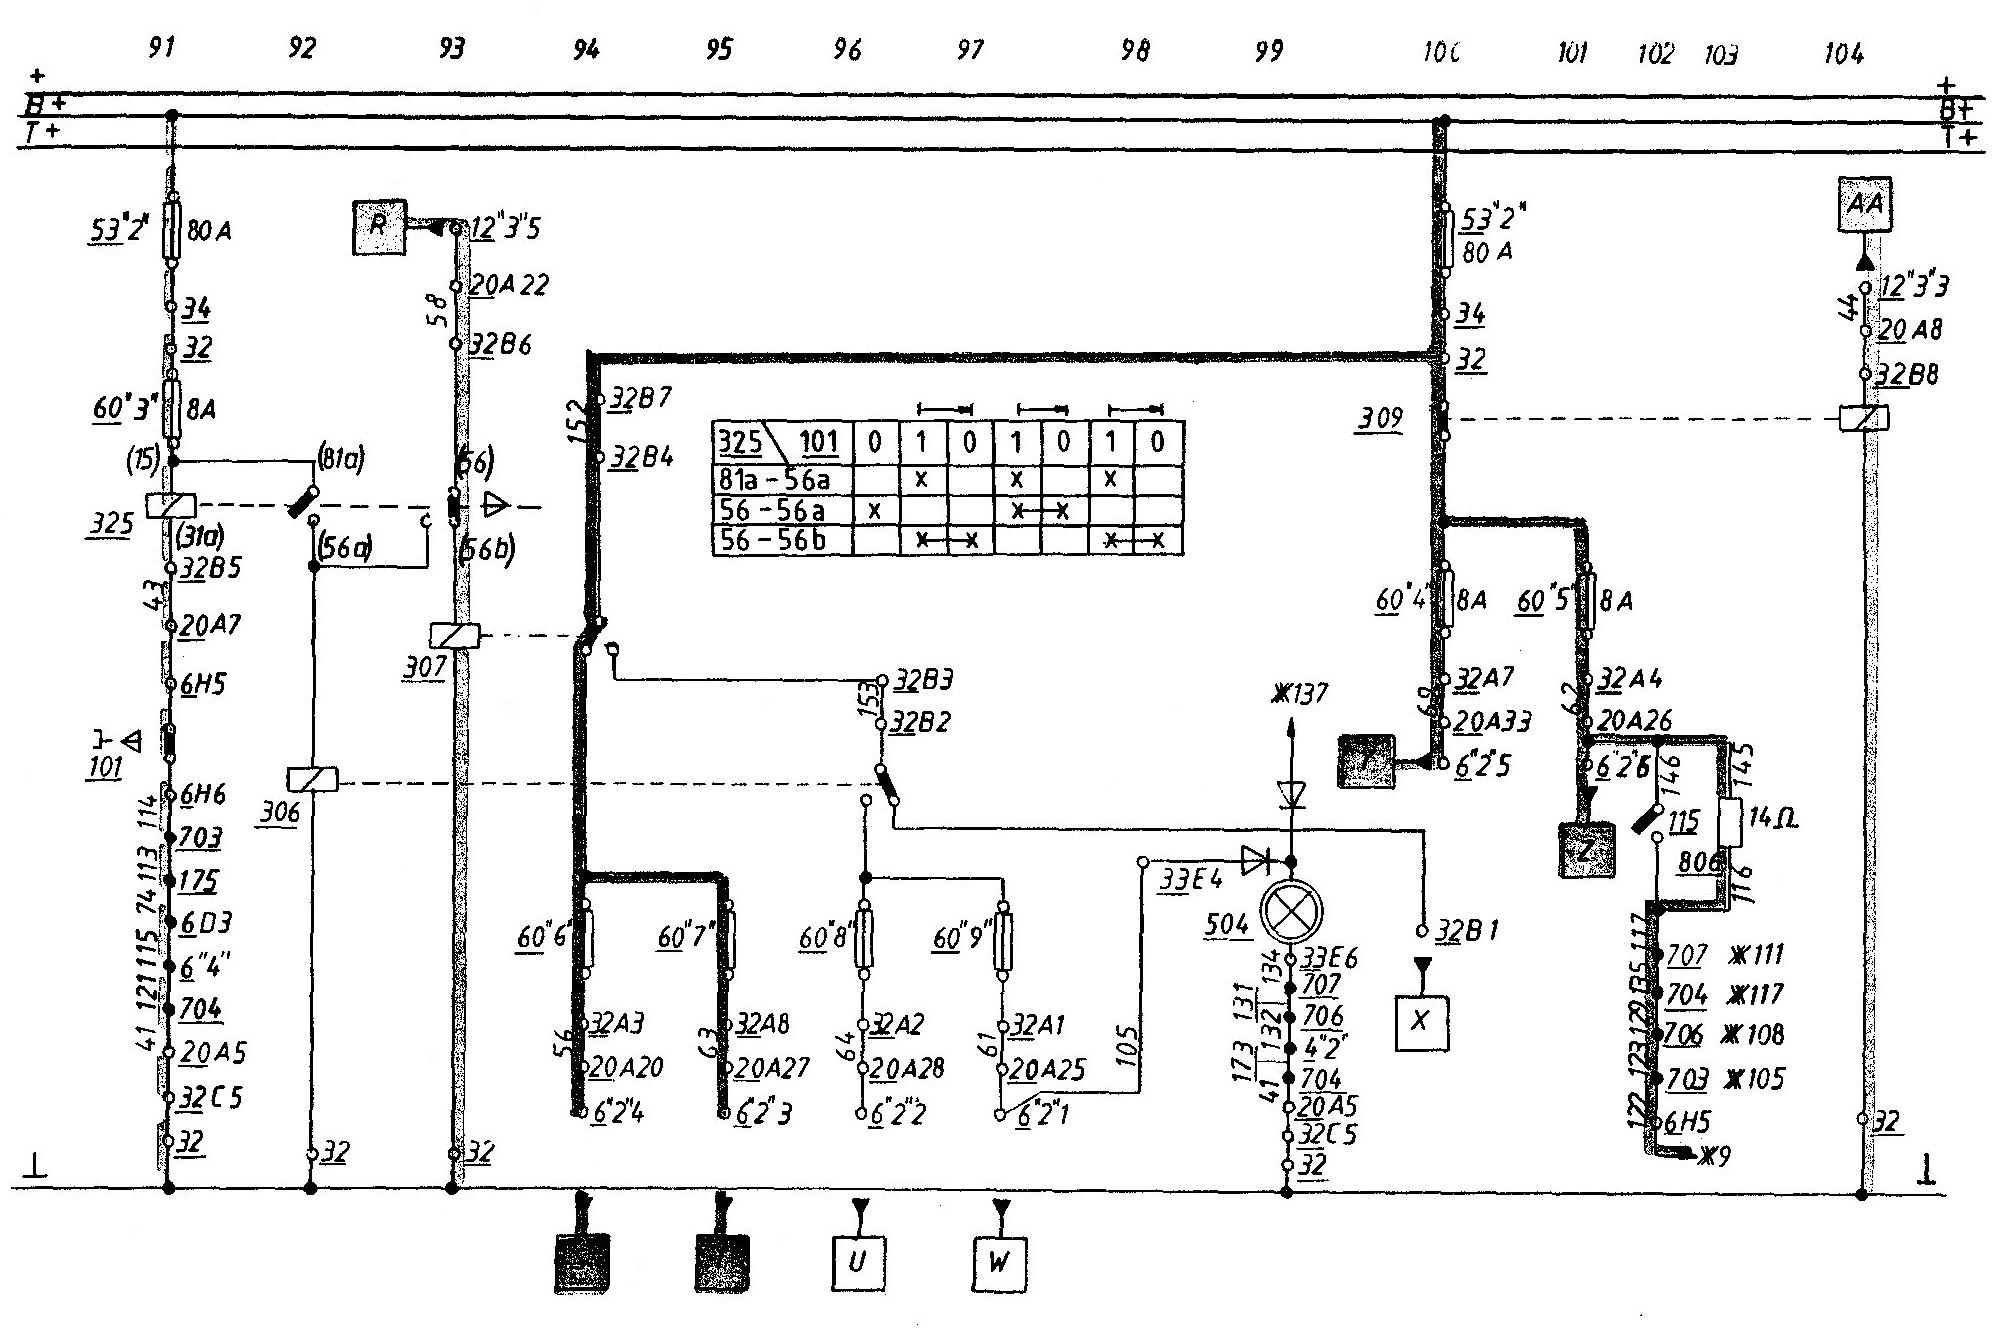 Volvo 240 Engine Diagram Volvo Brake Wiring Library Wiring Diagram • Of Volvo 240 Engine Diagram